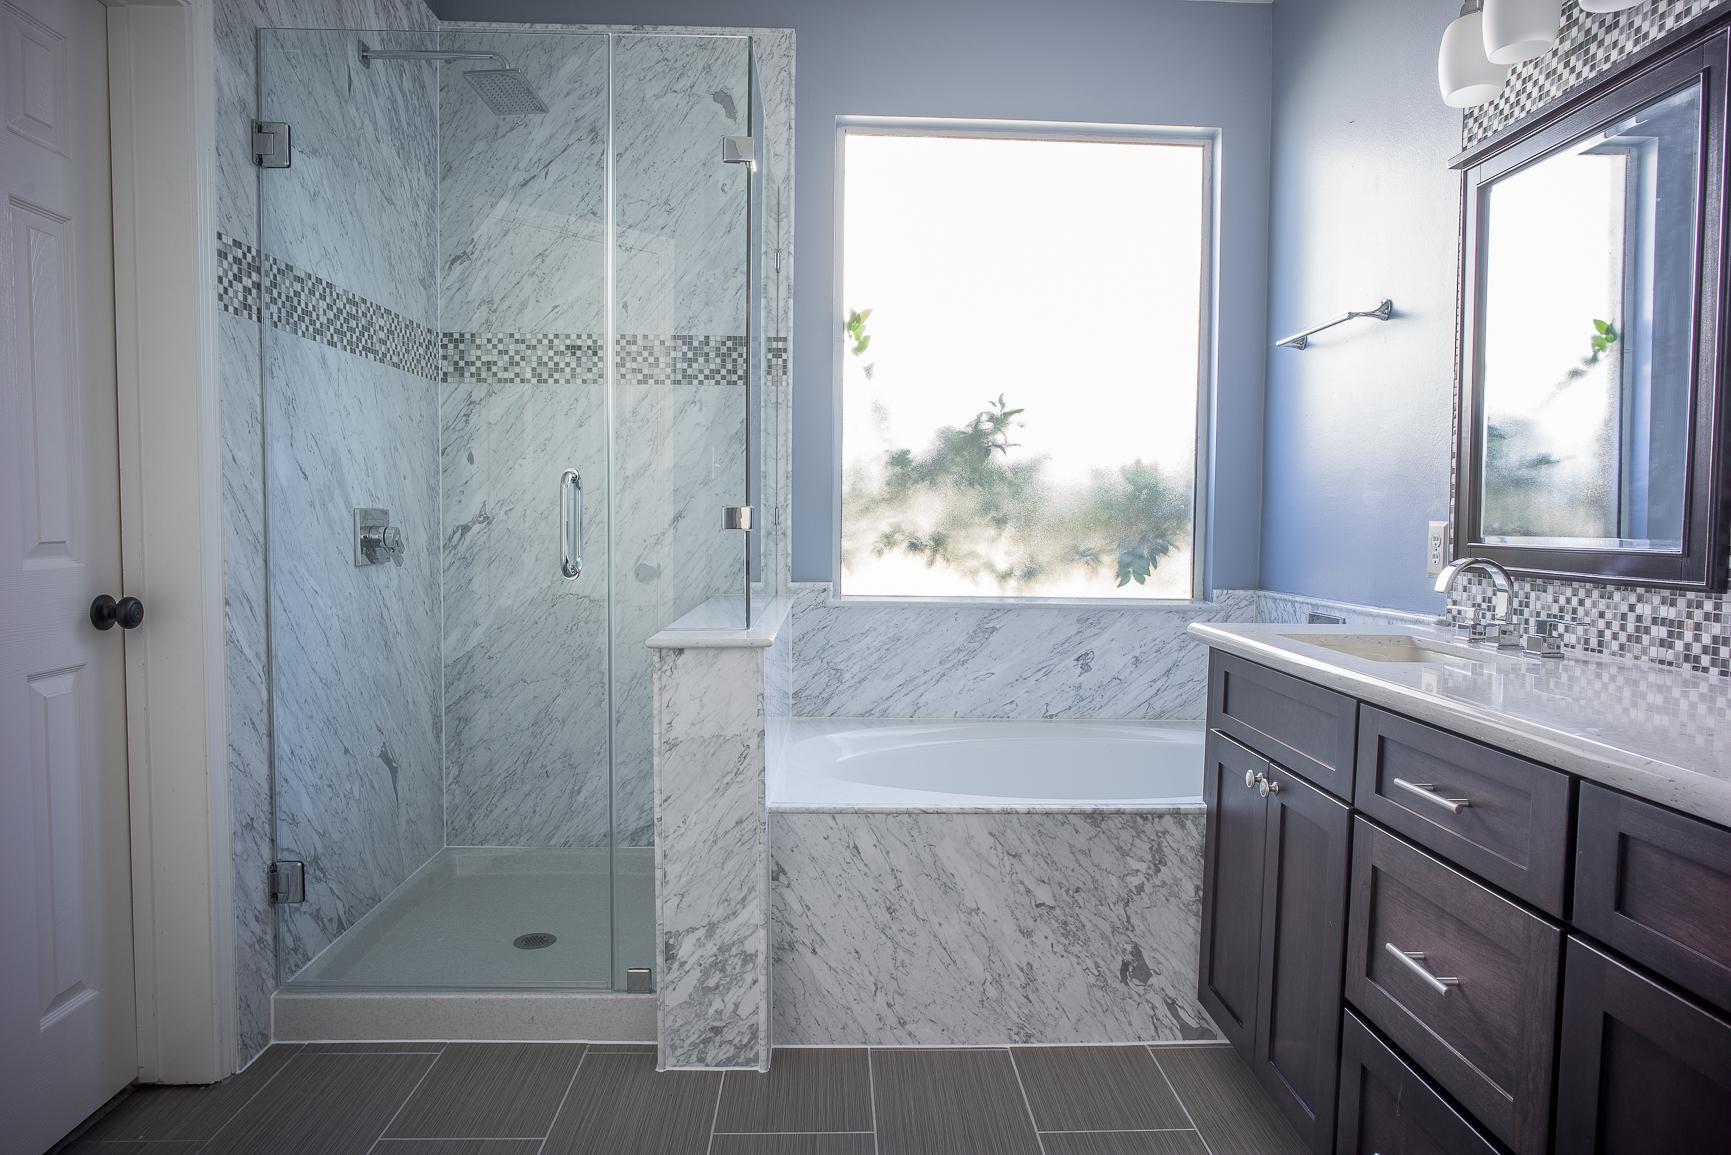 Beyond Kitchen And Bath Remodeling Llc